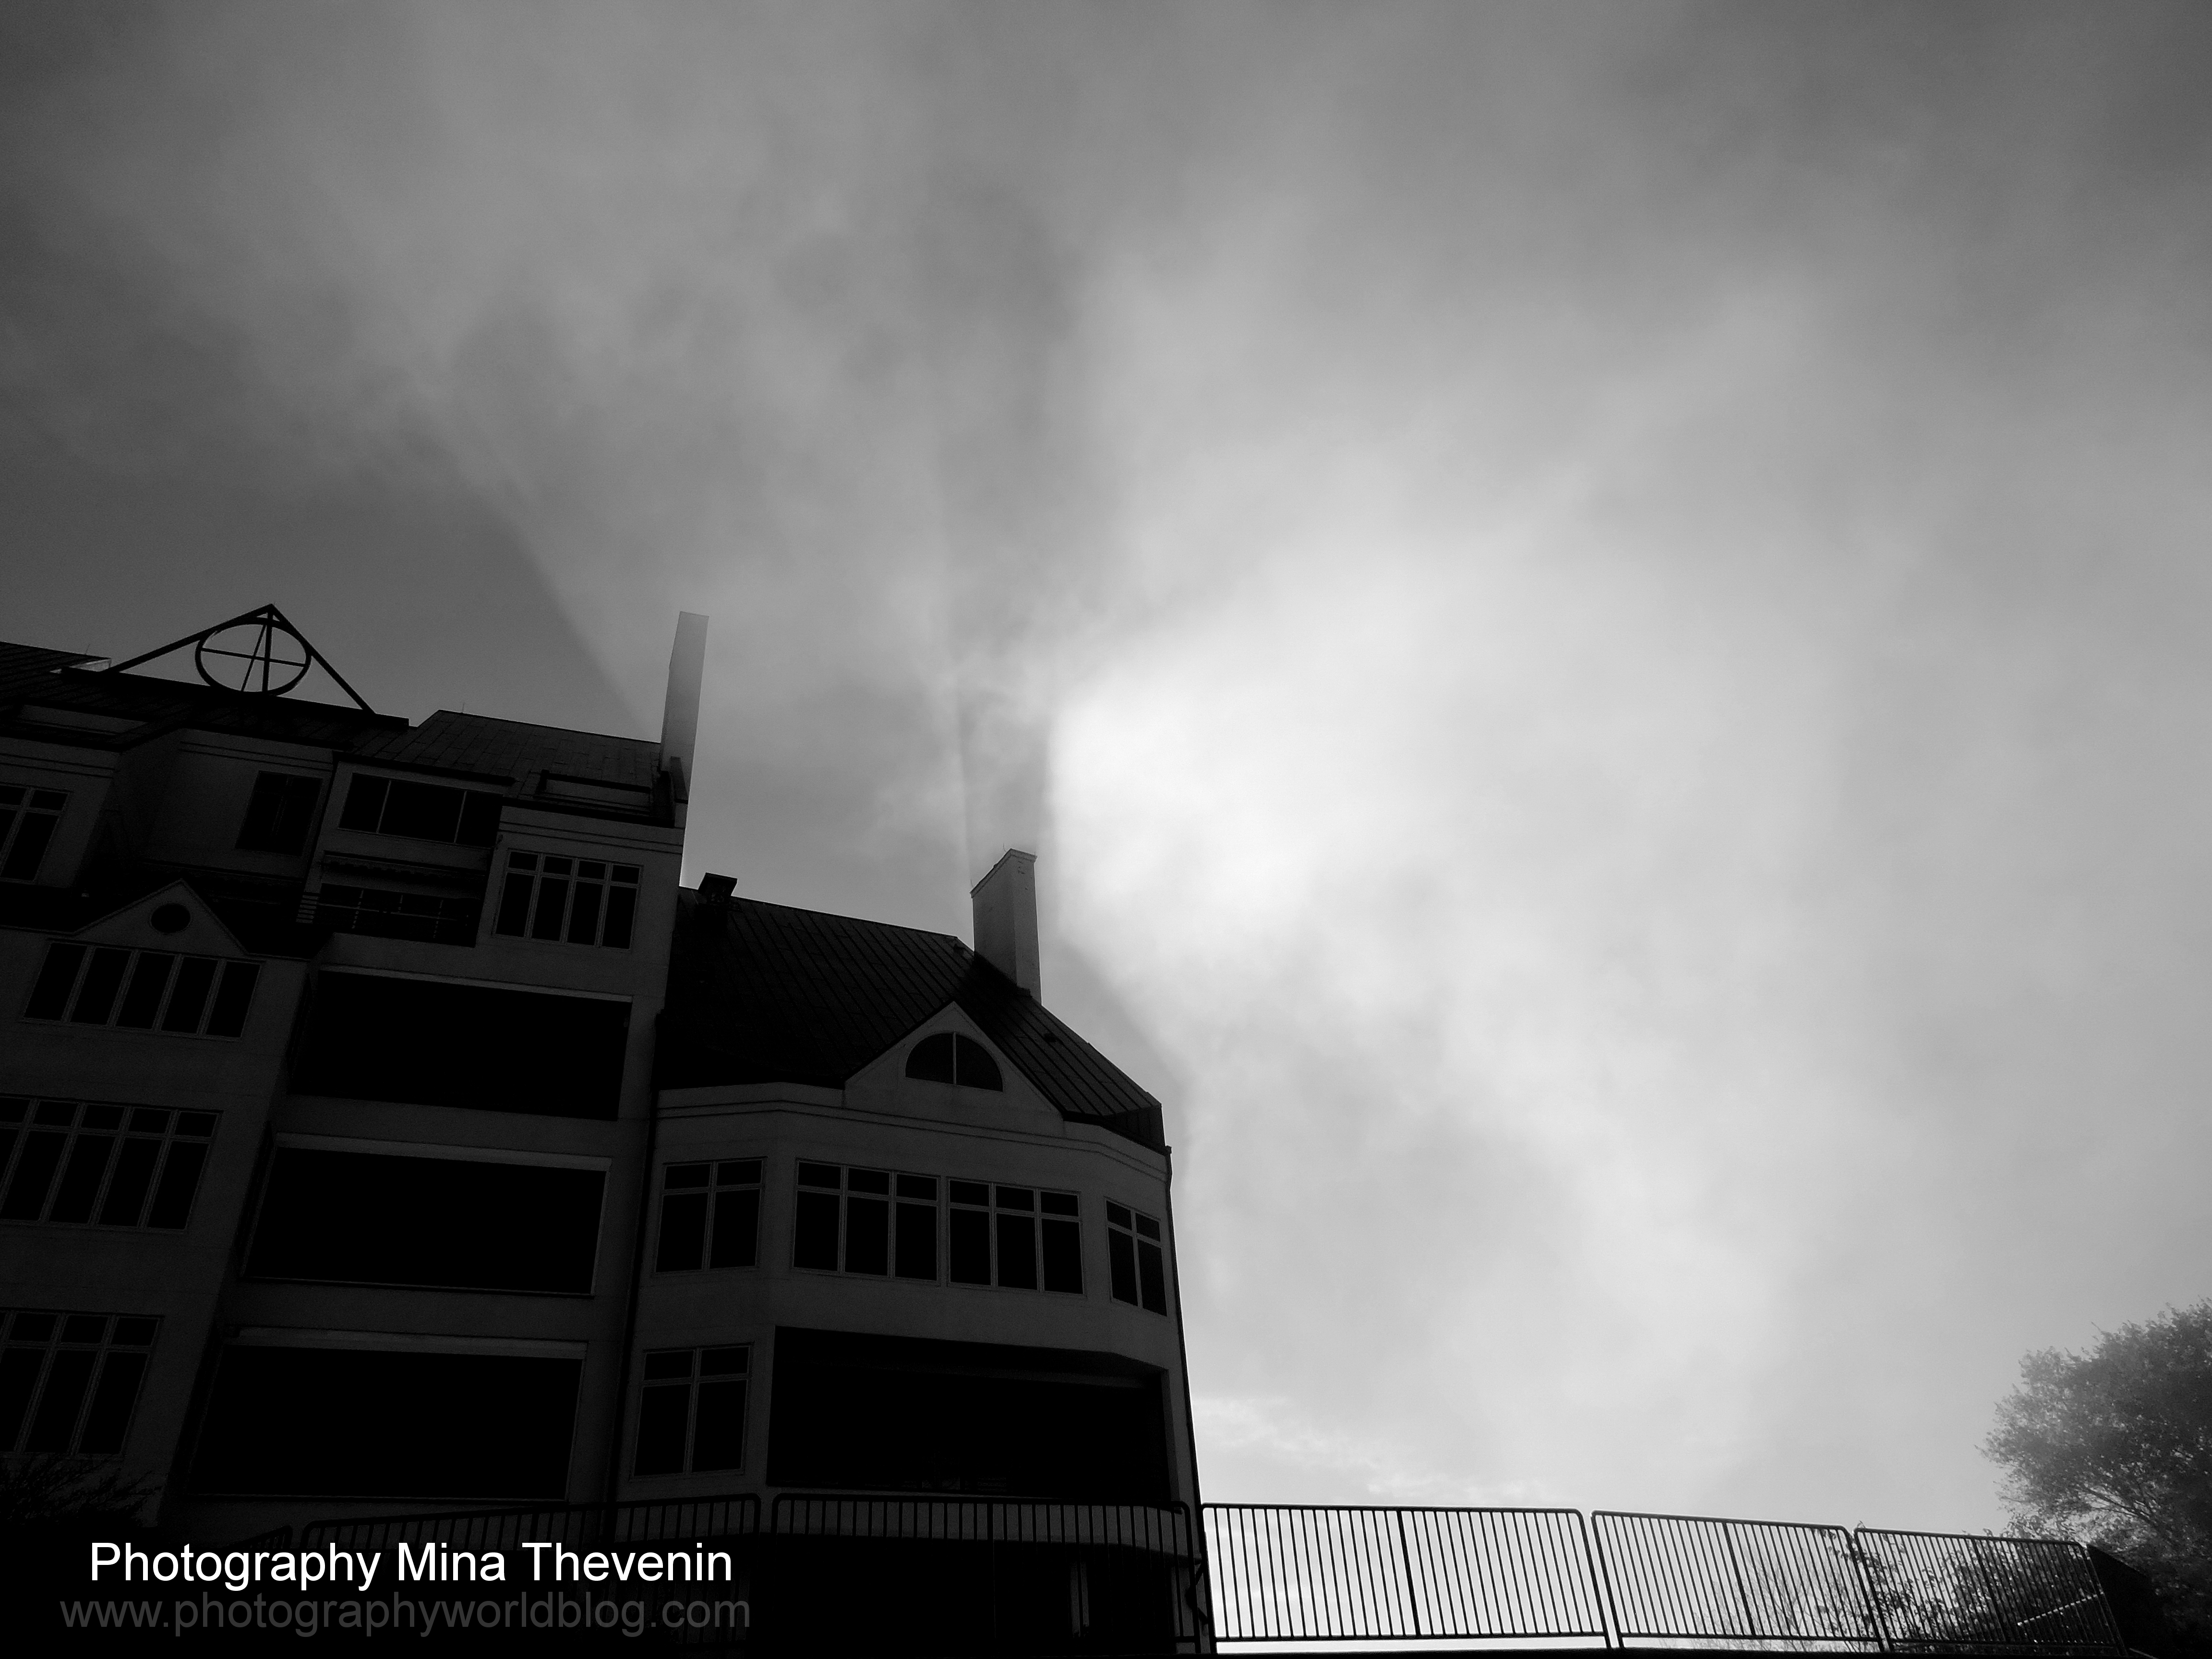 © Fog Shadows. Photograph by Mina Thevenin. Photography World Online Publication. www.photographyworld.org